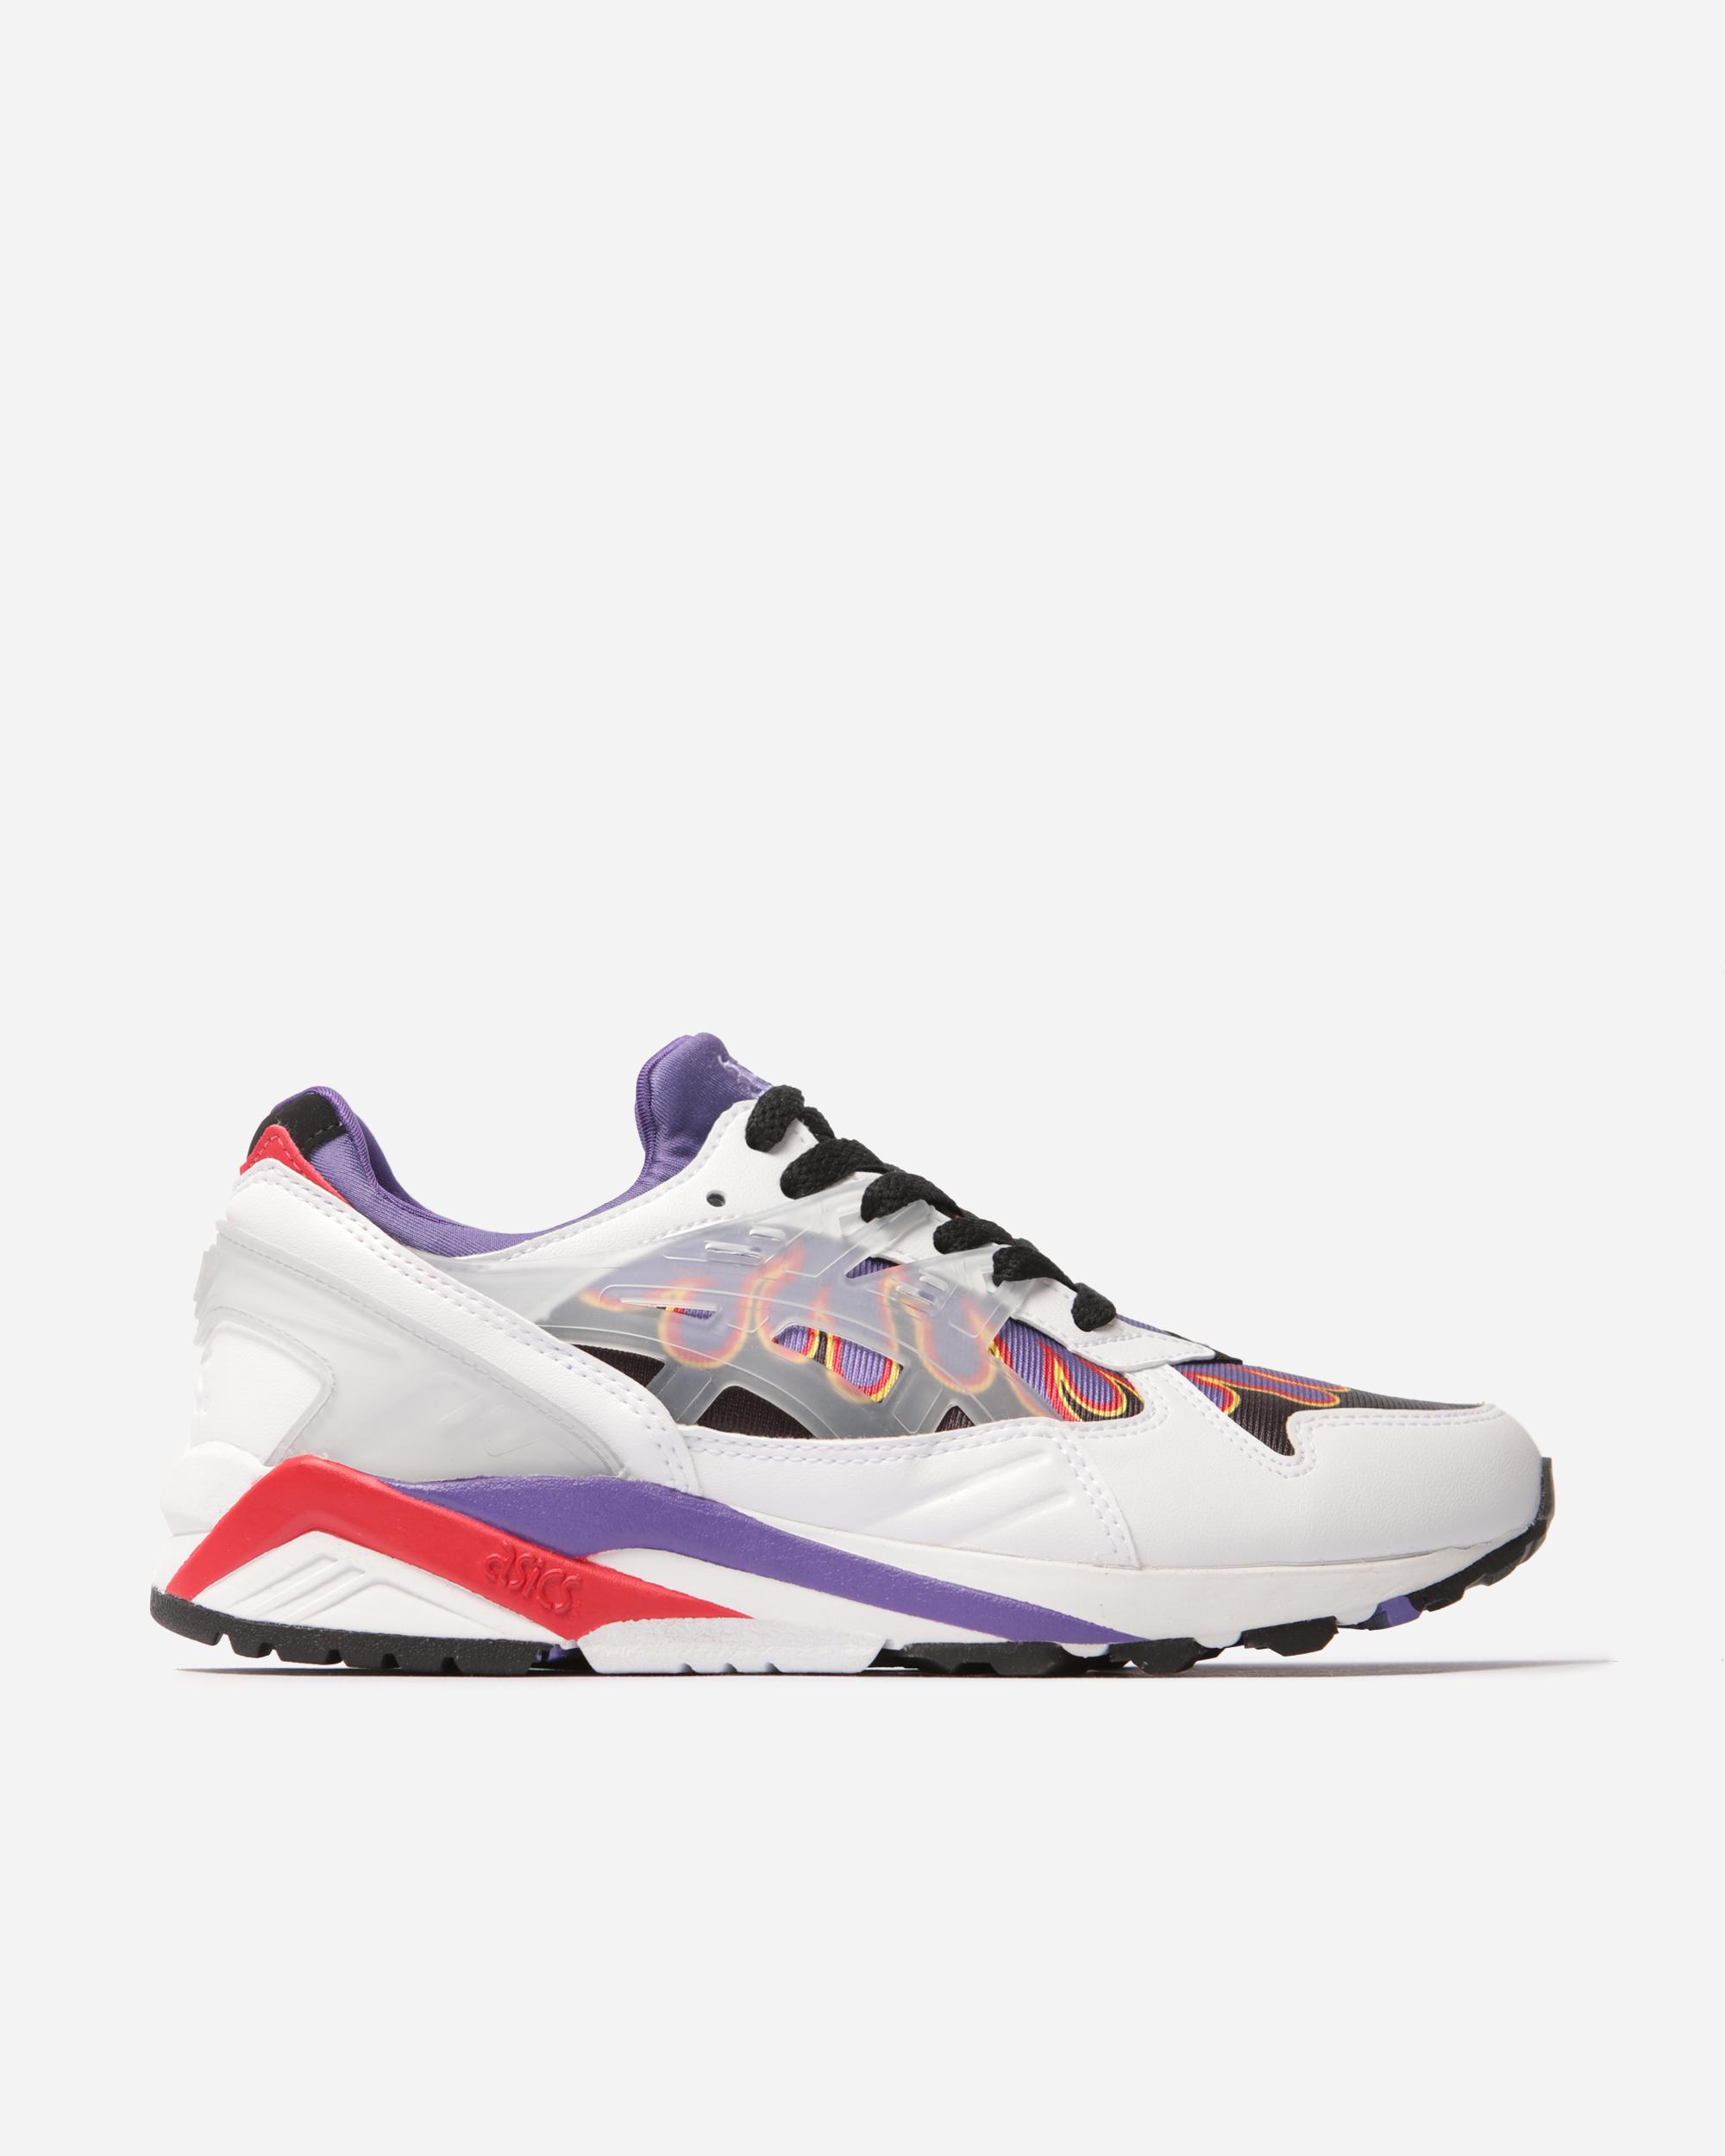 Asics Asics x Sneakerwolf Gel Kayano